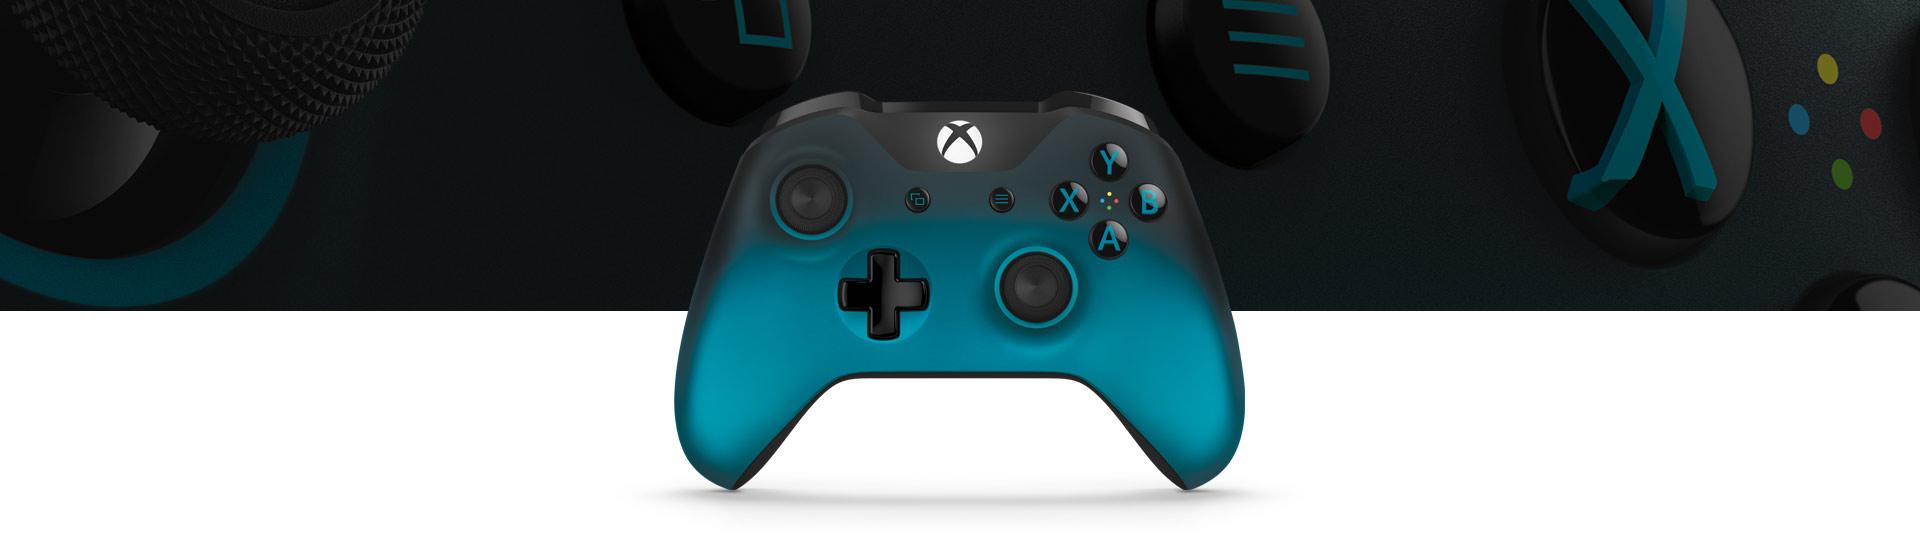 Xbox Ocean Shadow Special Edition draadloze controller